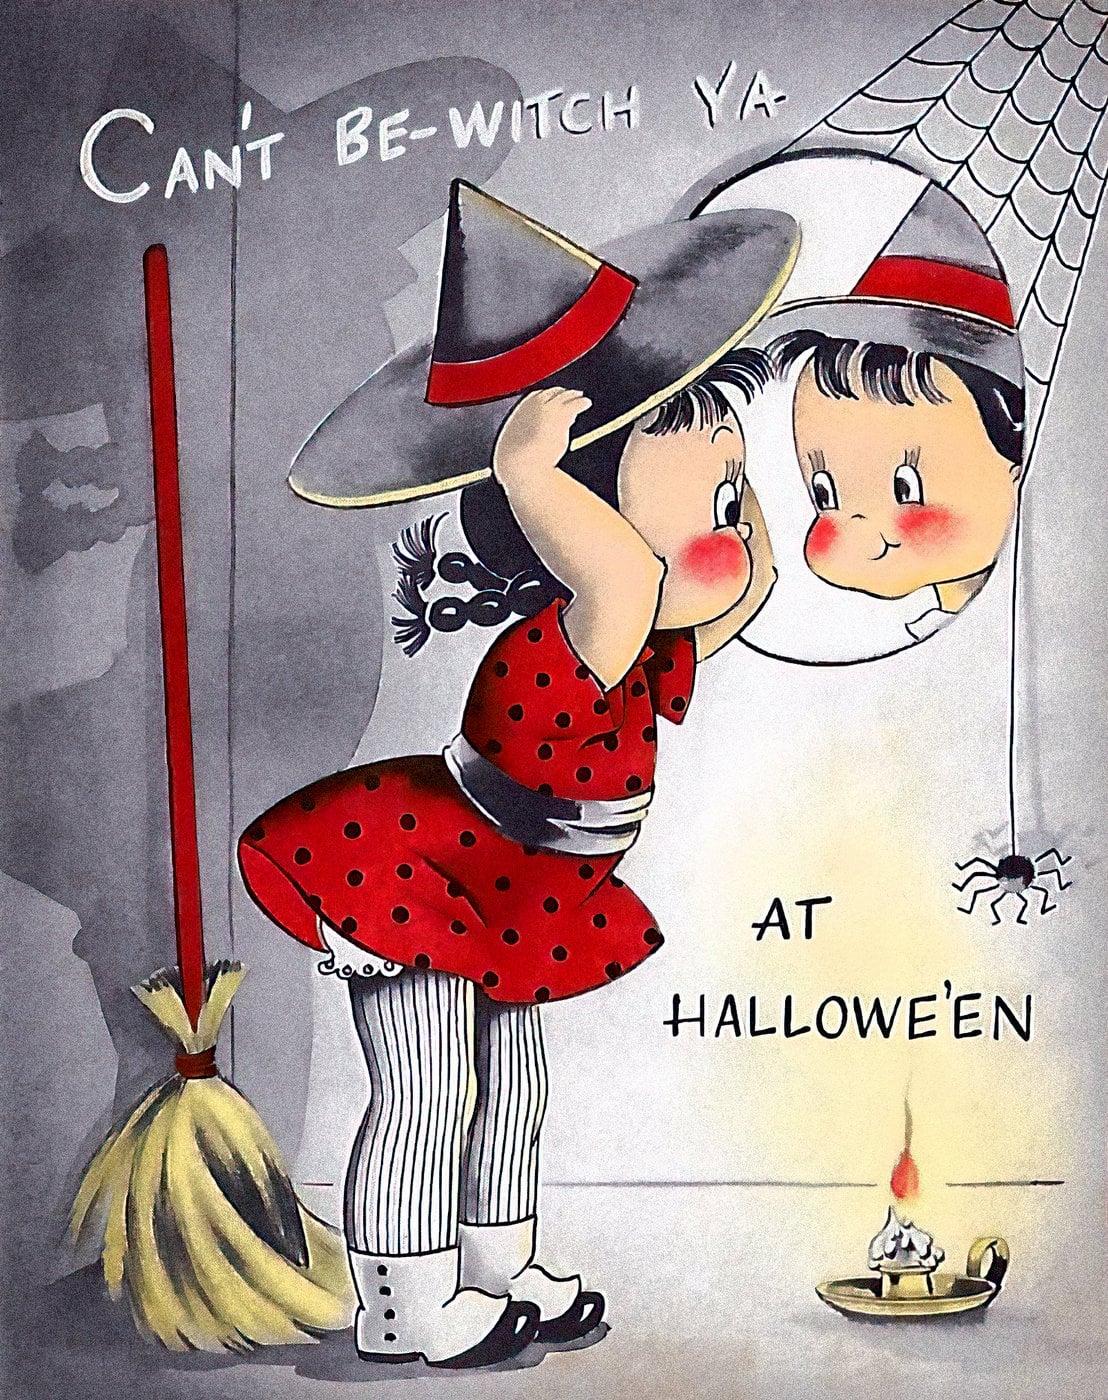 Vintage 1940s Halloween card